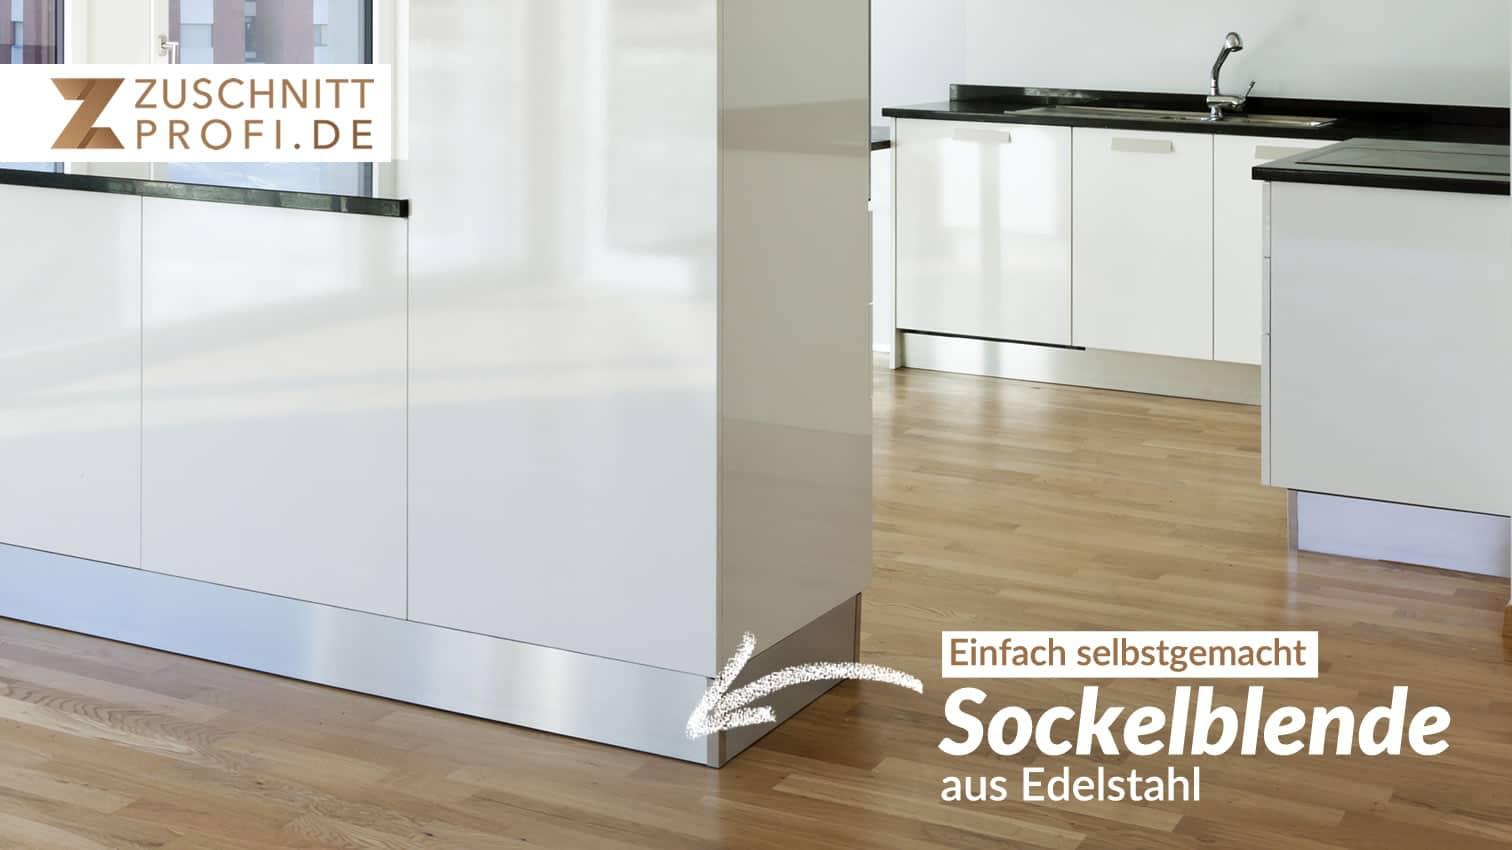 Design Sockelblende aus Edelstahl selbst gemacht